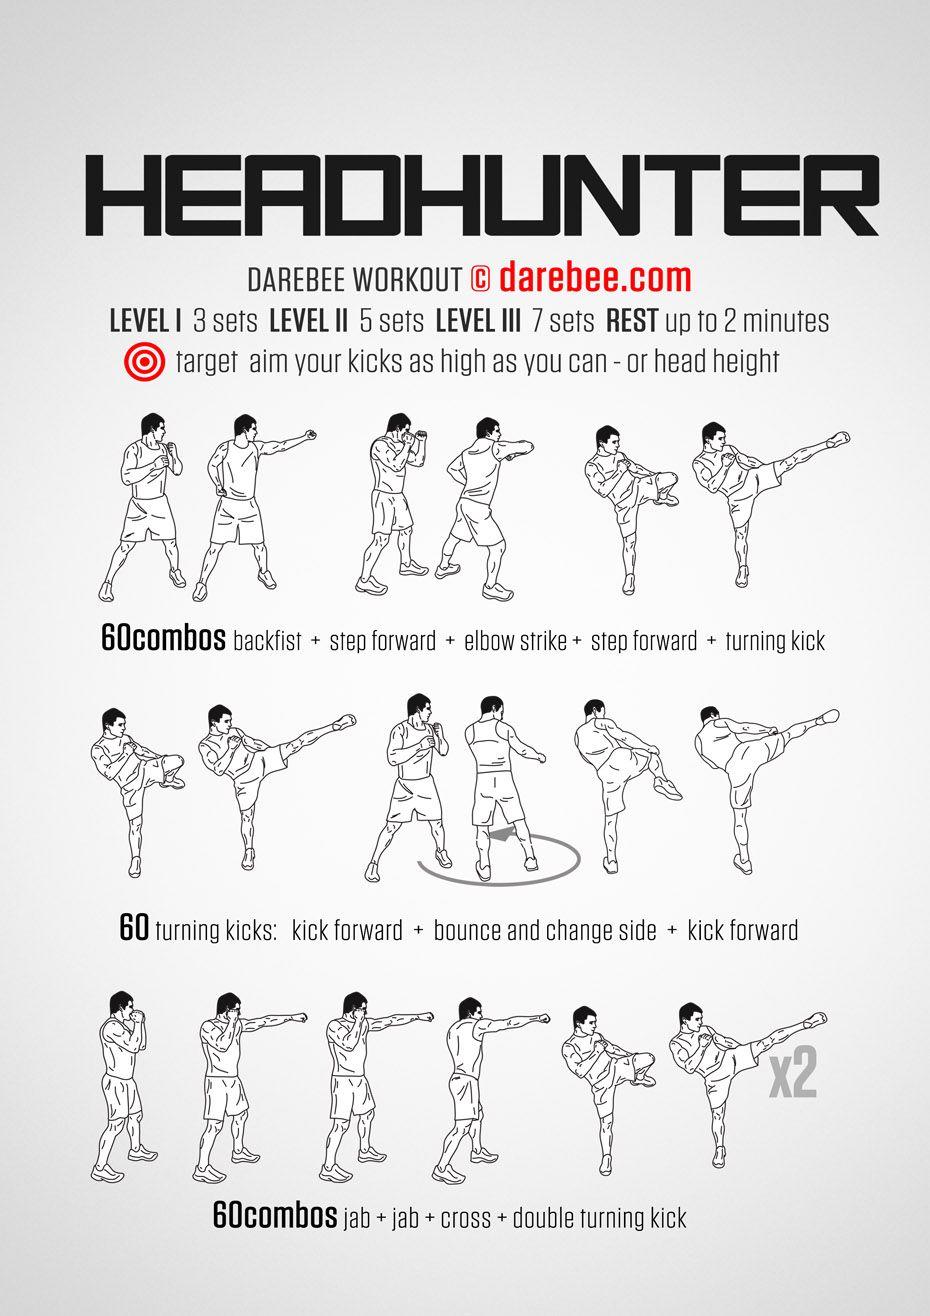 Headhunter workout martial arts workout kickboxing